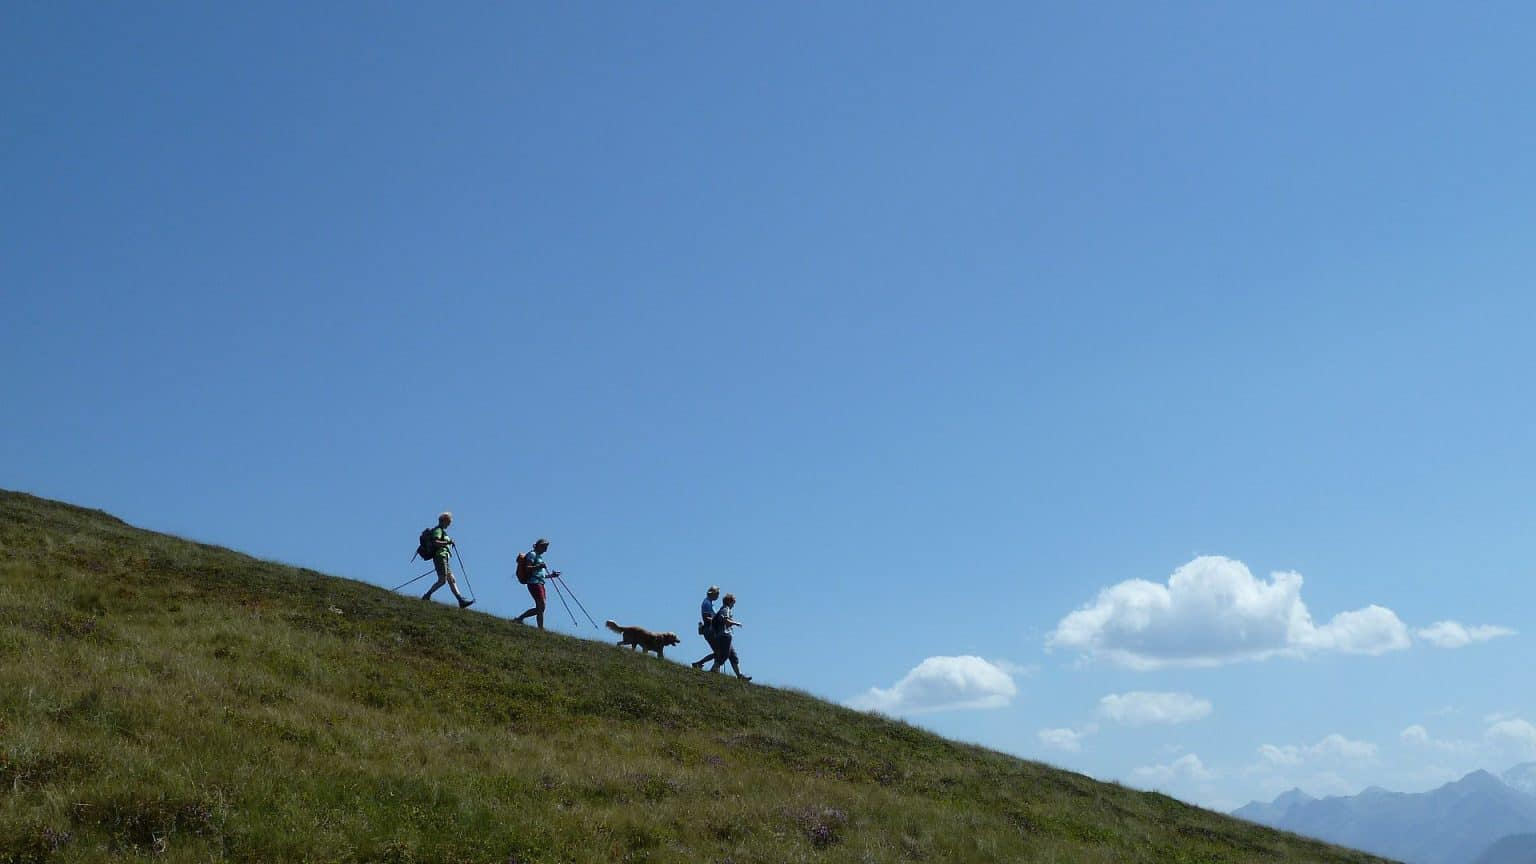 bra tid Vandring hund gräsbergen Pinzgau Zell am See